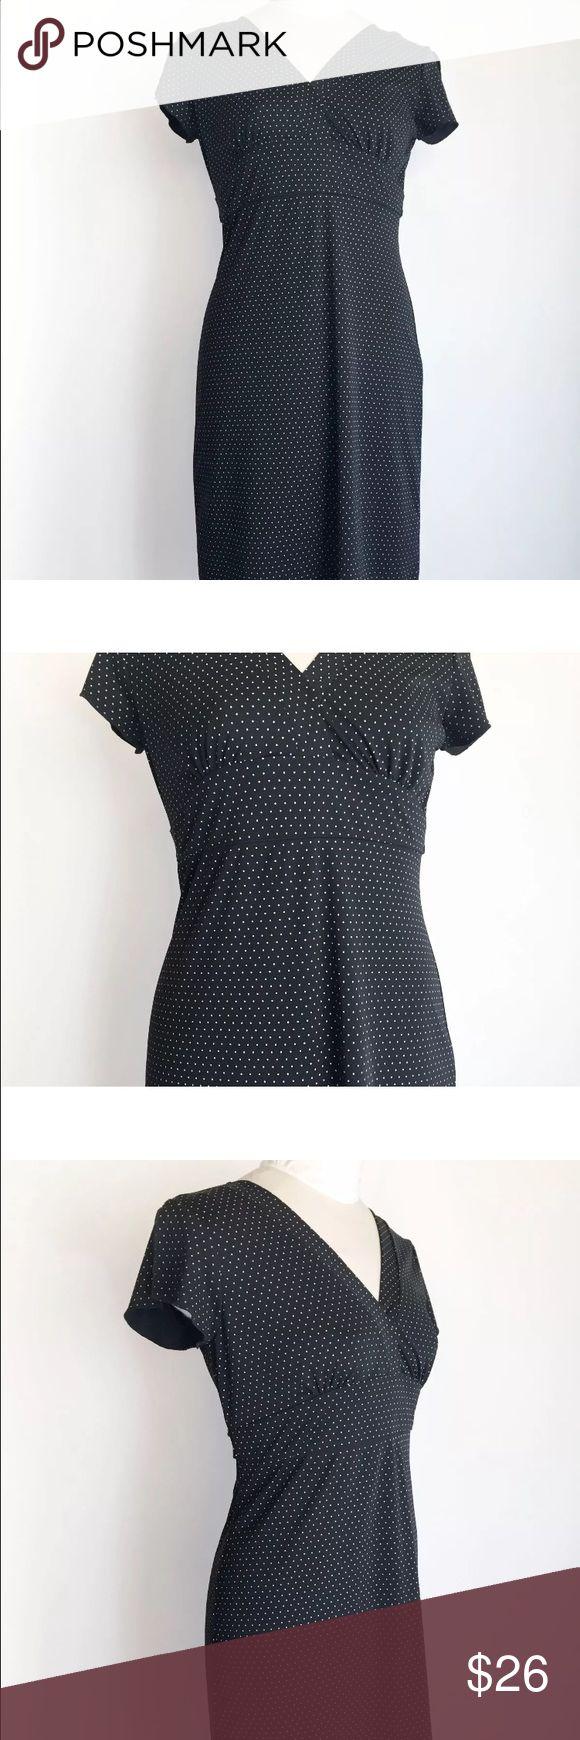 b smart long dresses patterns